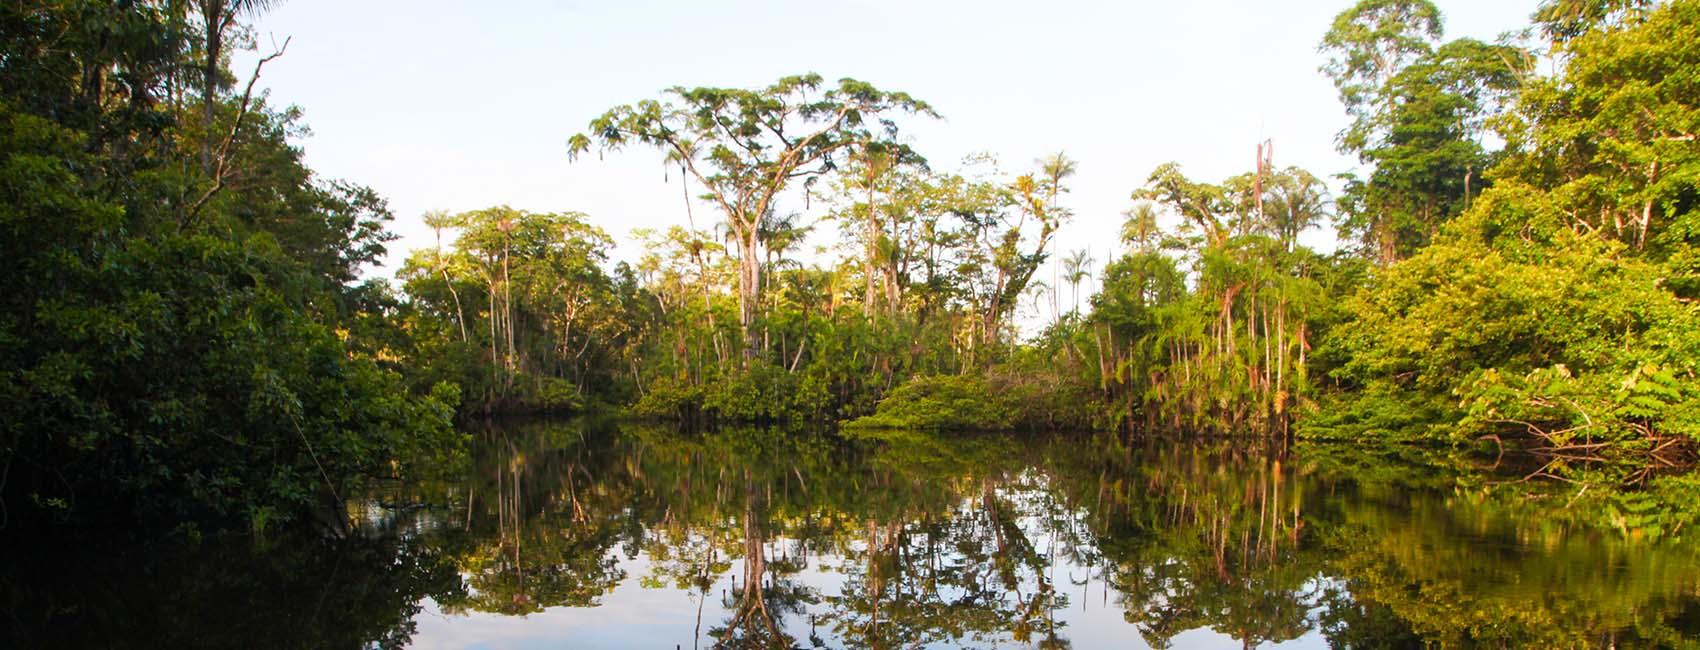 Amazon National Parks